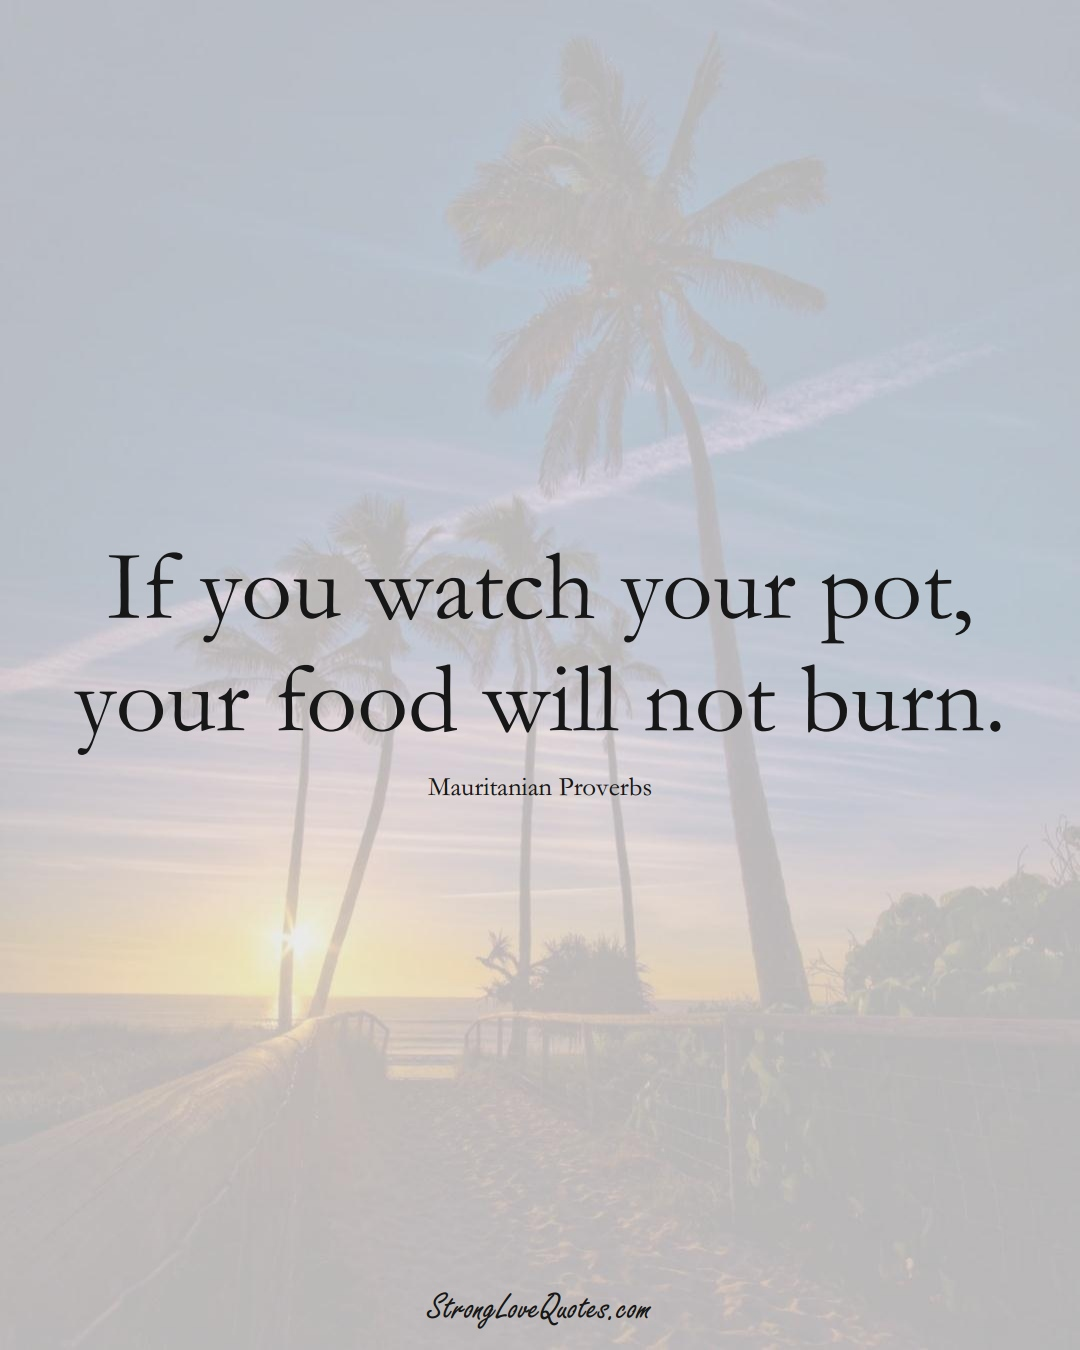 If you watch your pot, your food will not burn. (Mauritanian Sayings);  #AfricanSayings